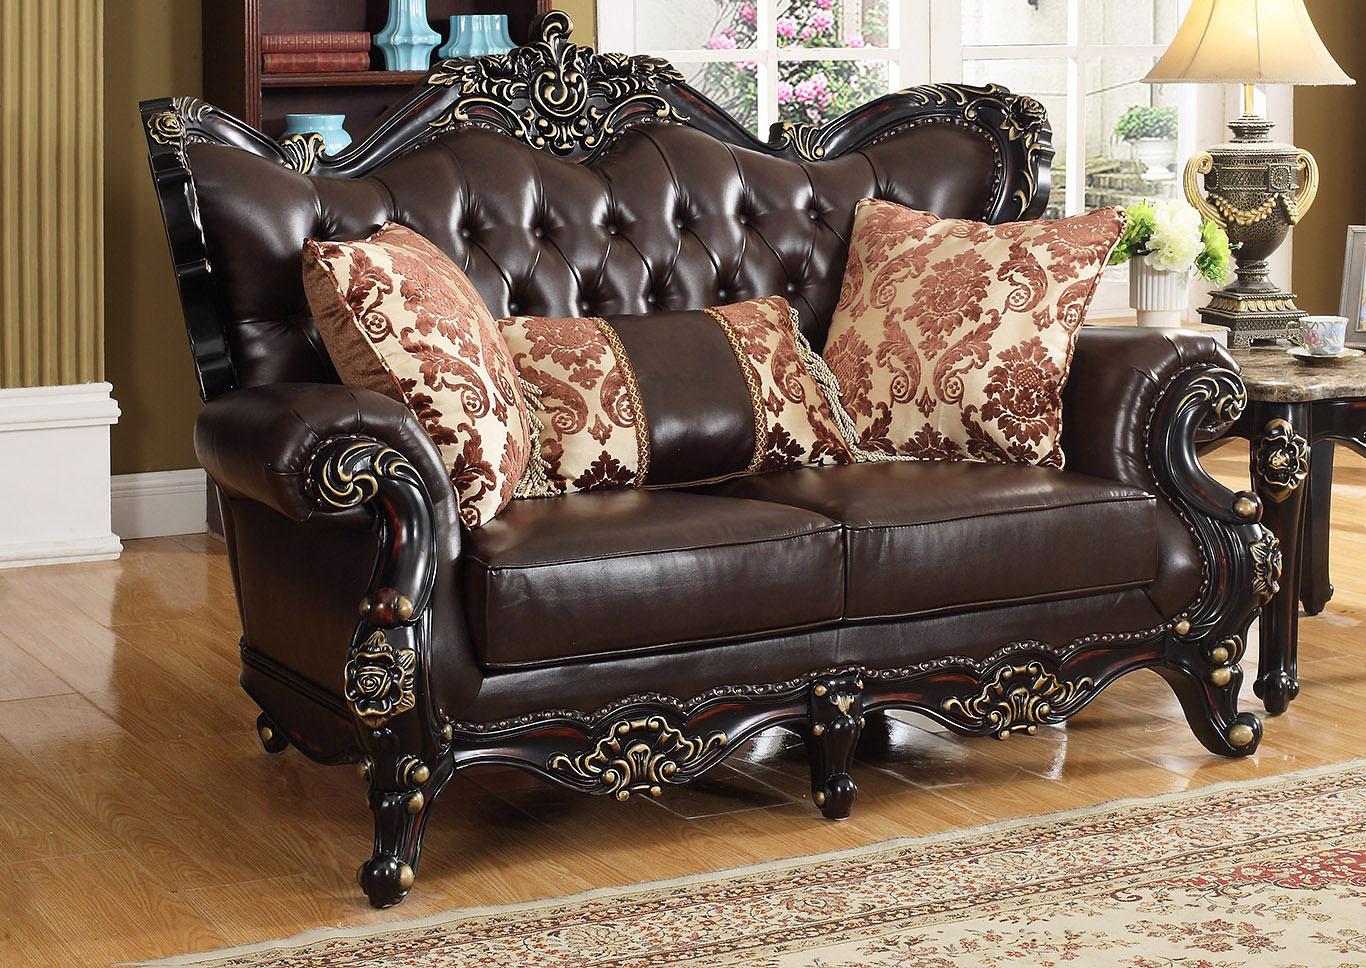 Town of Bargains Furniture Dark Brown Leather Loveseat w ...